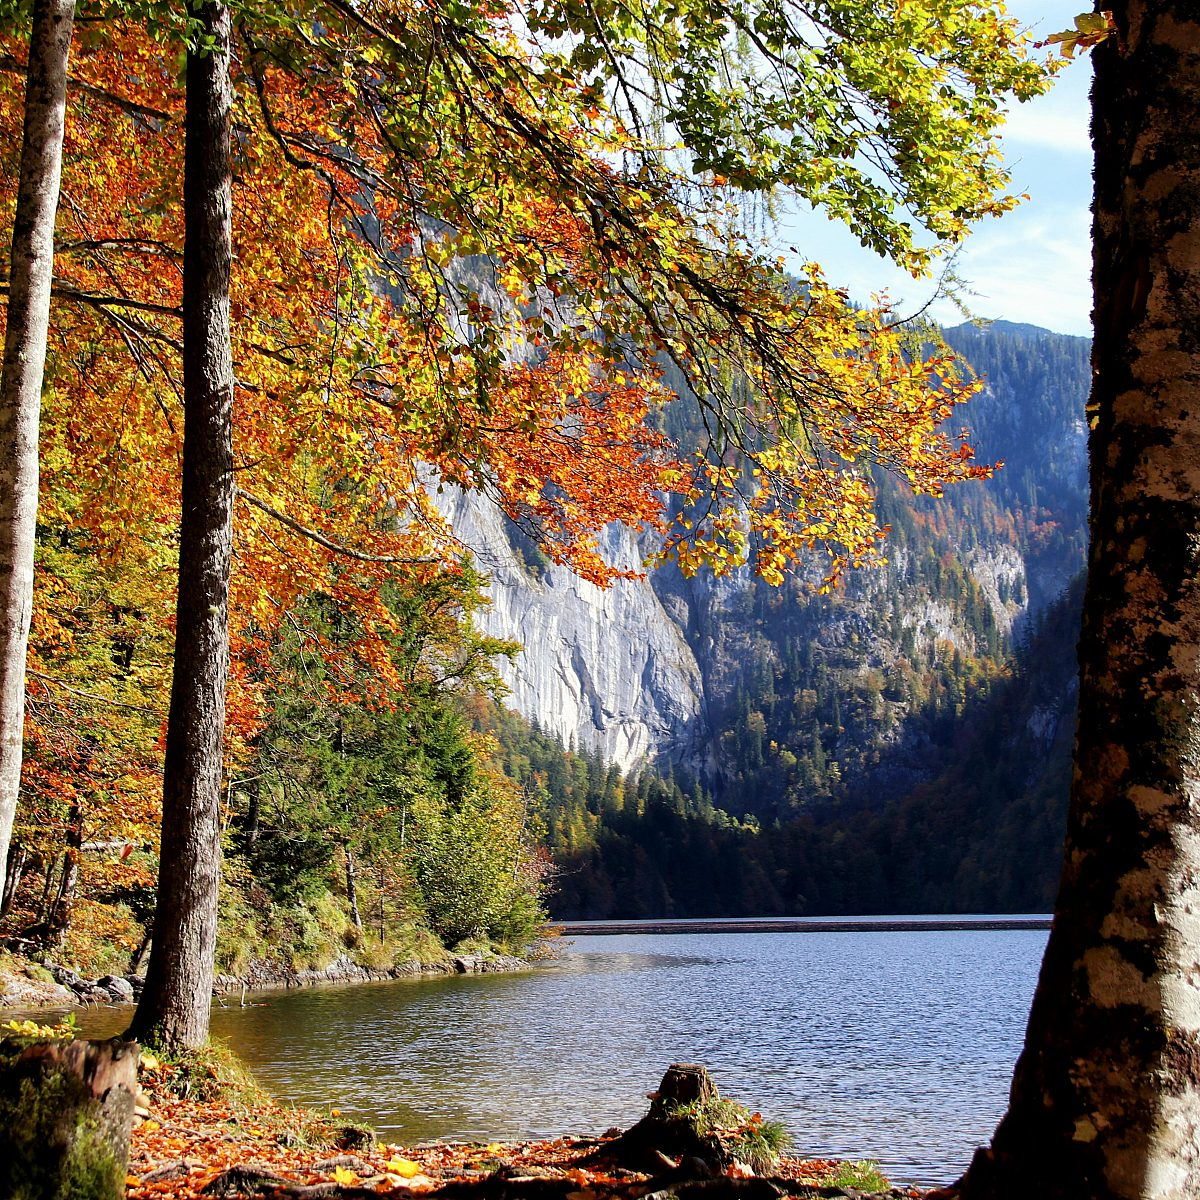 Herbst am Toplitzsee